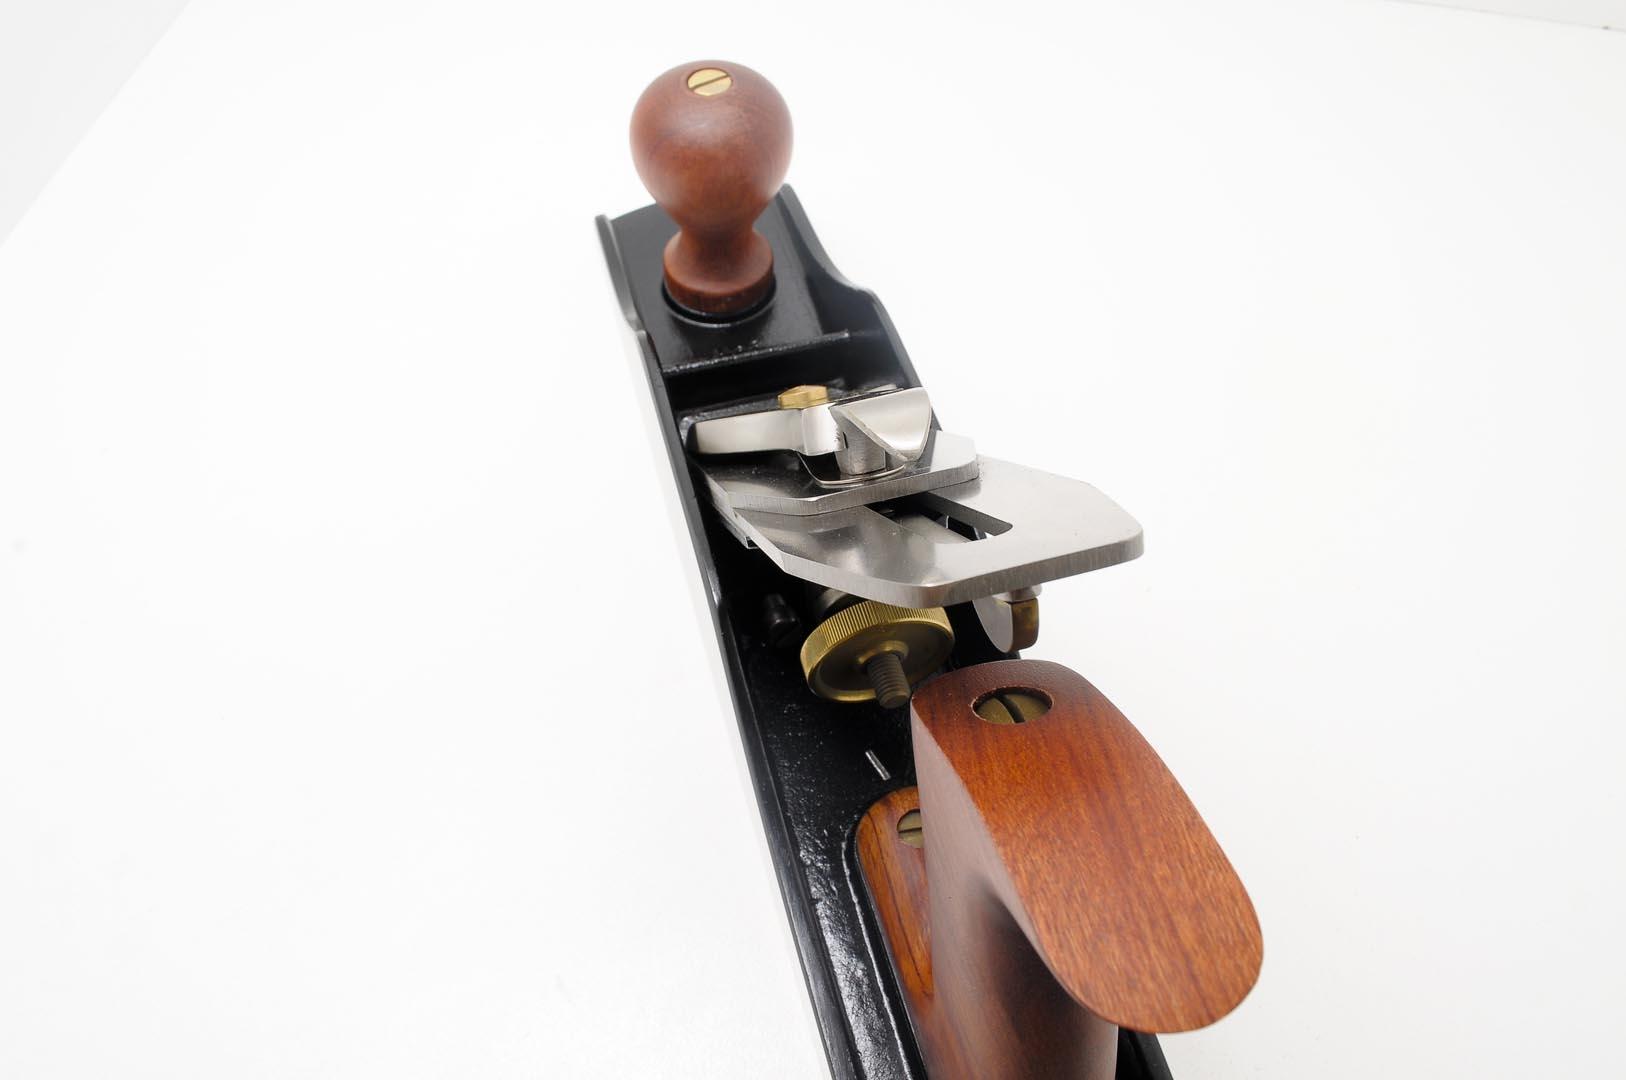 150875-Cepillo 5 bedrock garlopin para carpinteria WoodRiver 150875-max-4.